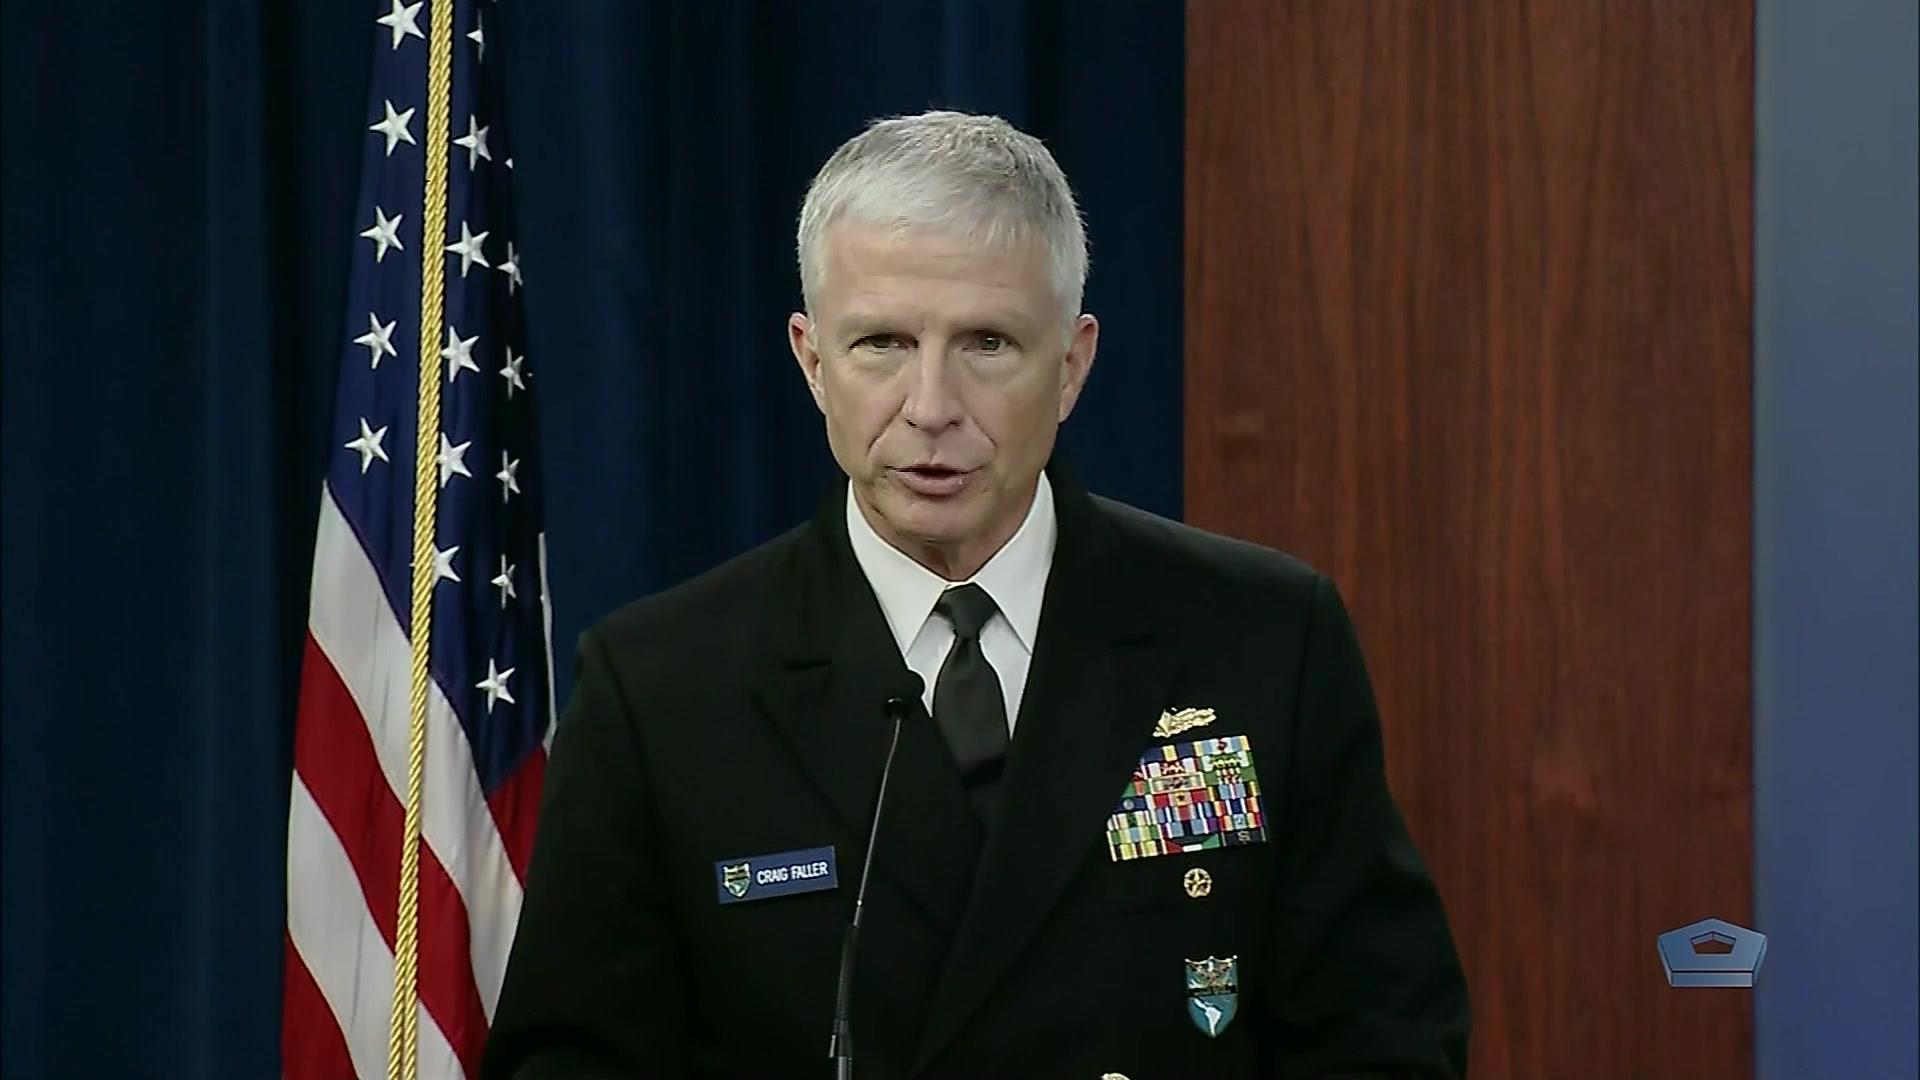 Air Force Gen. Glen D. VanHerck, U.S. Northern Command commander, and Navy Adm. Craig S. Faller, U.S. Southern Command commander, brief the news media at the Pentagon, March 16, 2021.